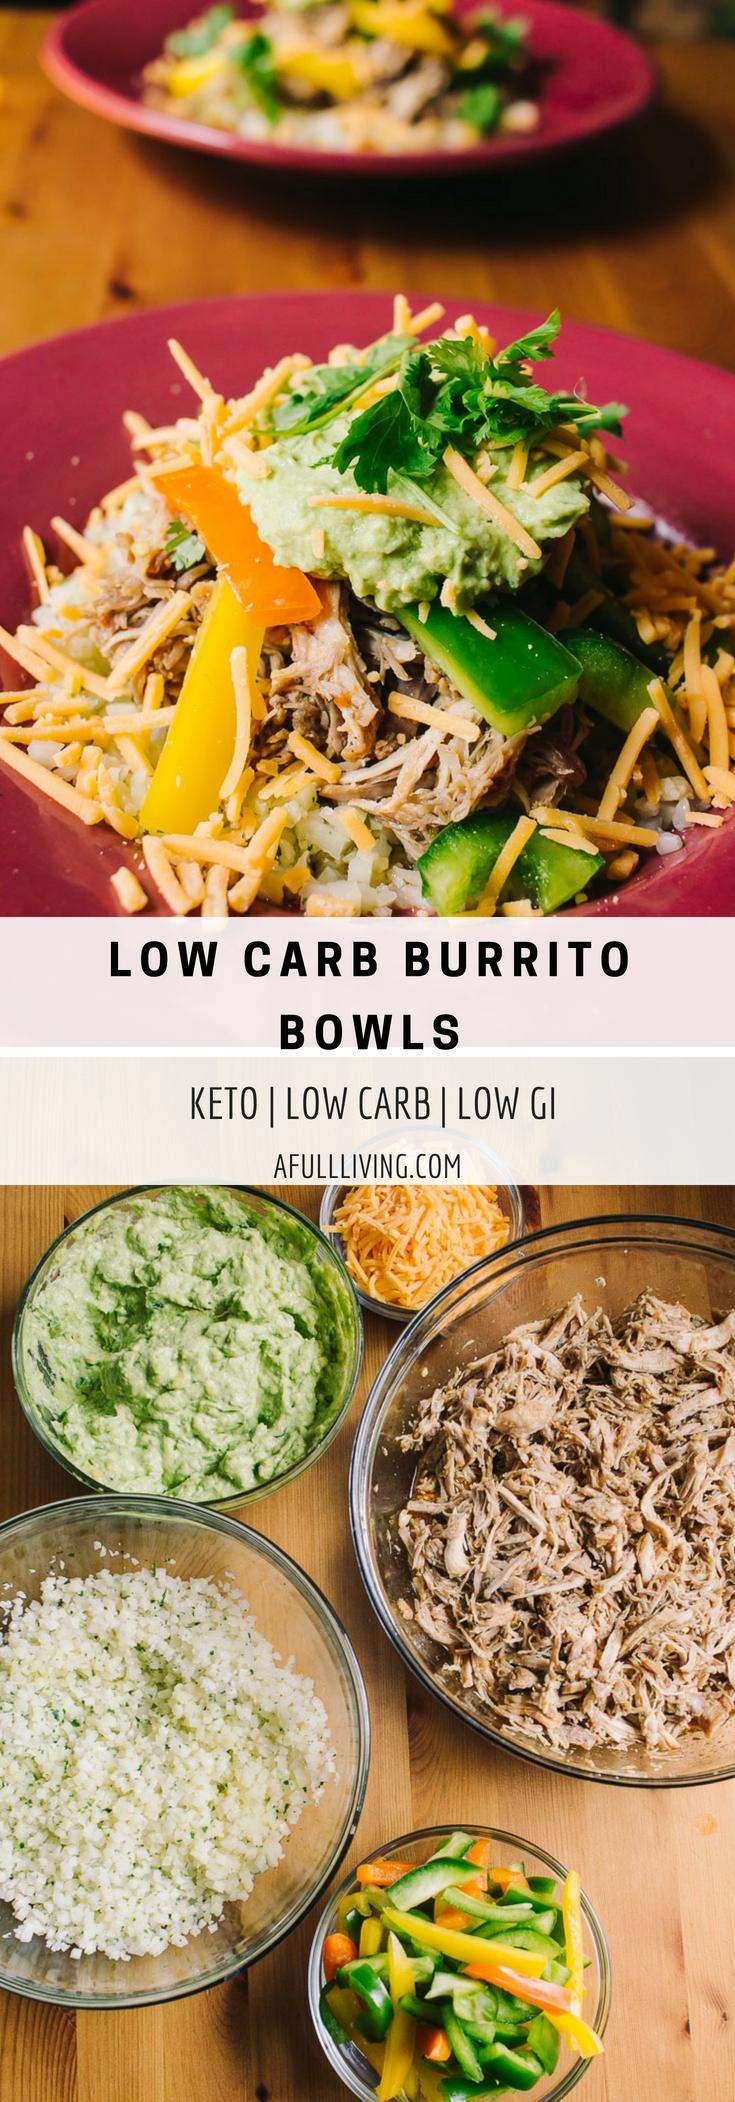 Low Carb Burrito Bowls A Full Living low gi keto